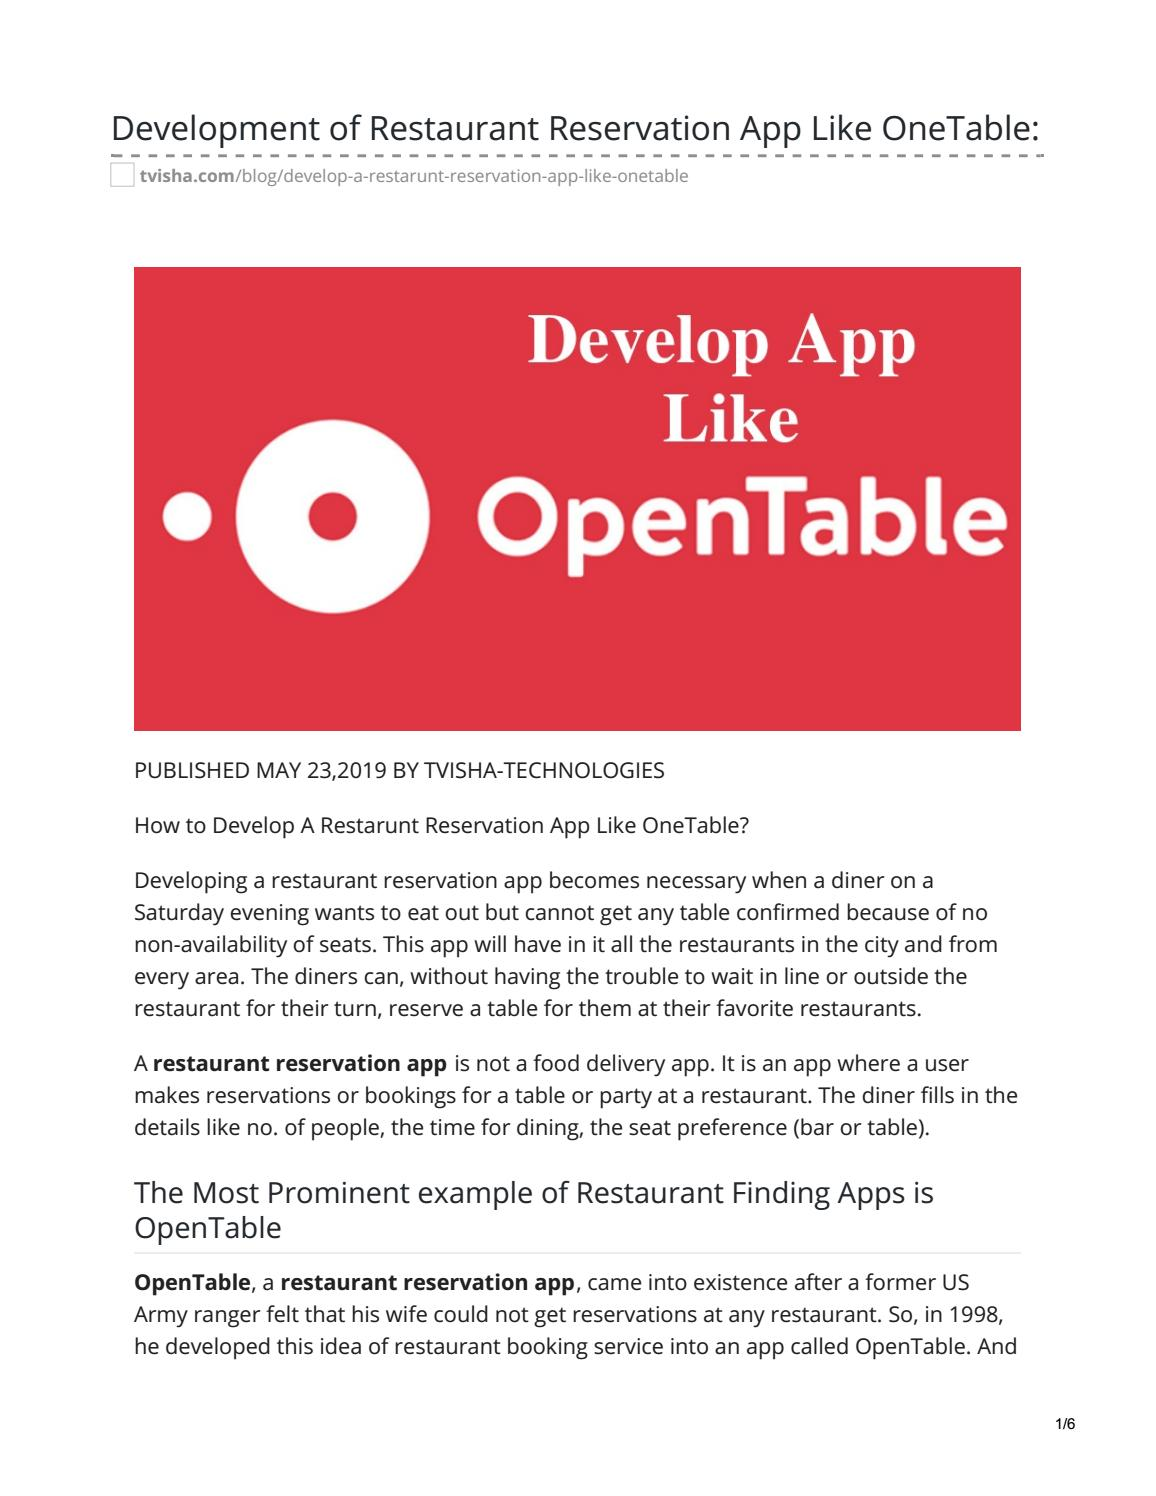 Develop App Like Onetable Restaurant Reservation App